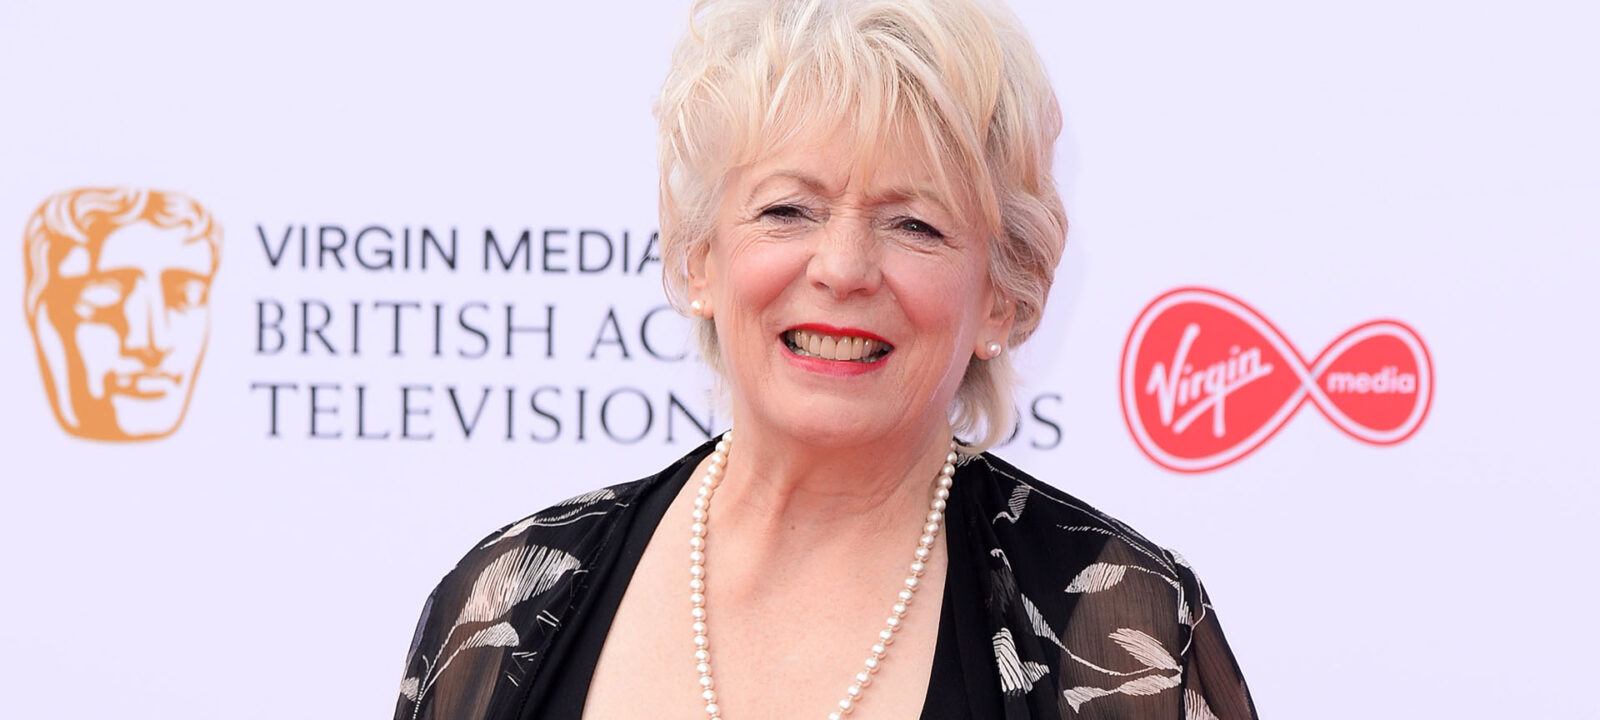 Virgin Media British Academy Television Awards 2019 – Red Carpet Arrivals